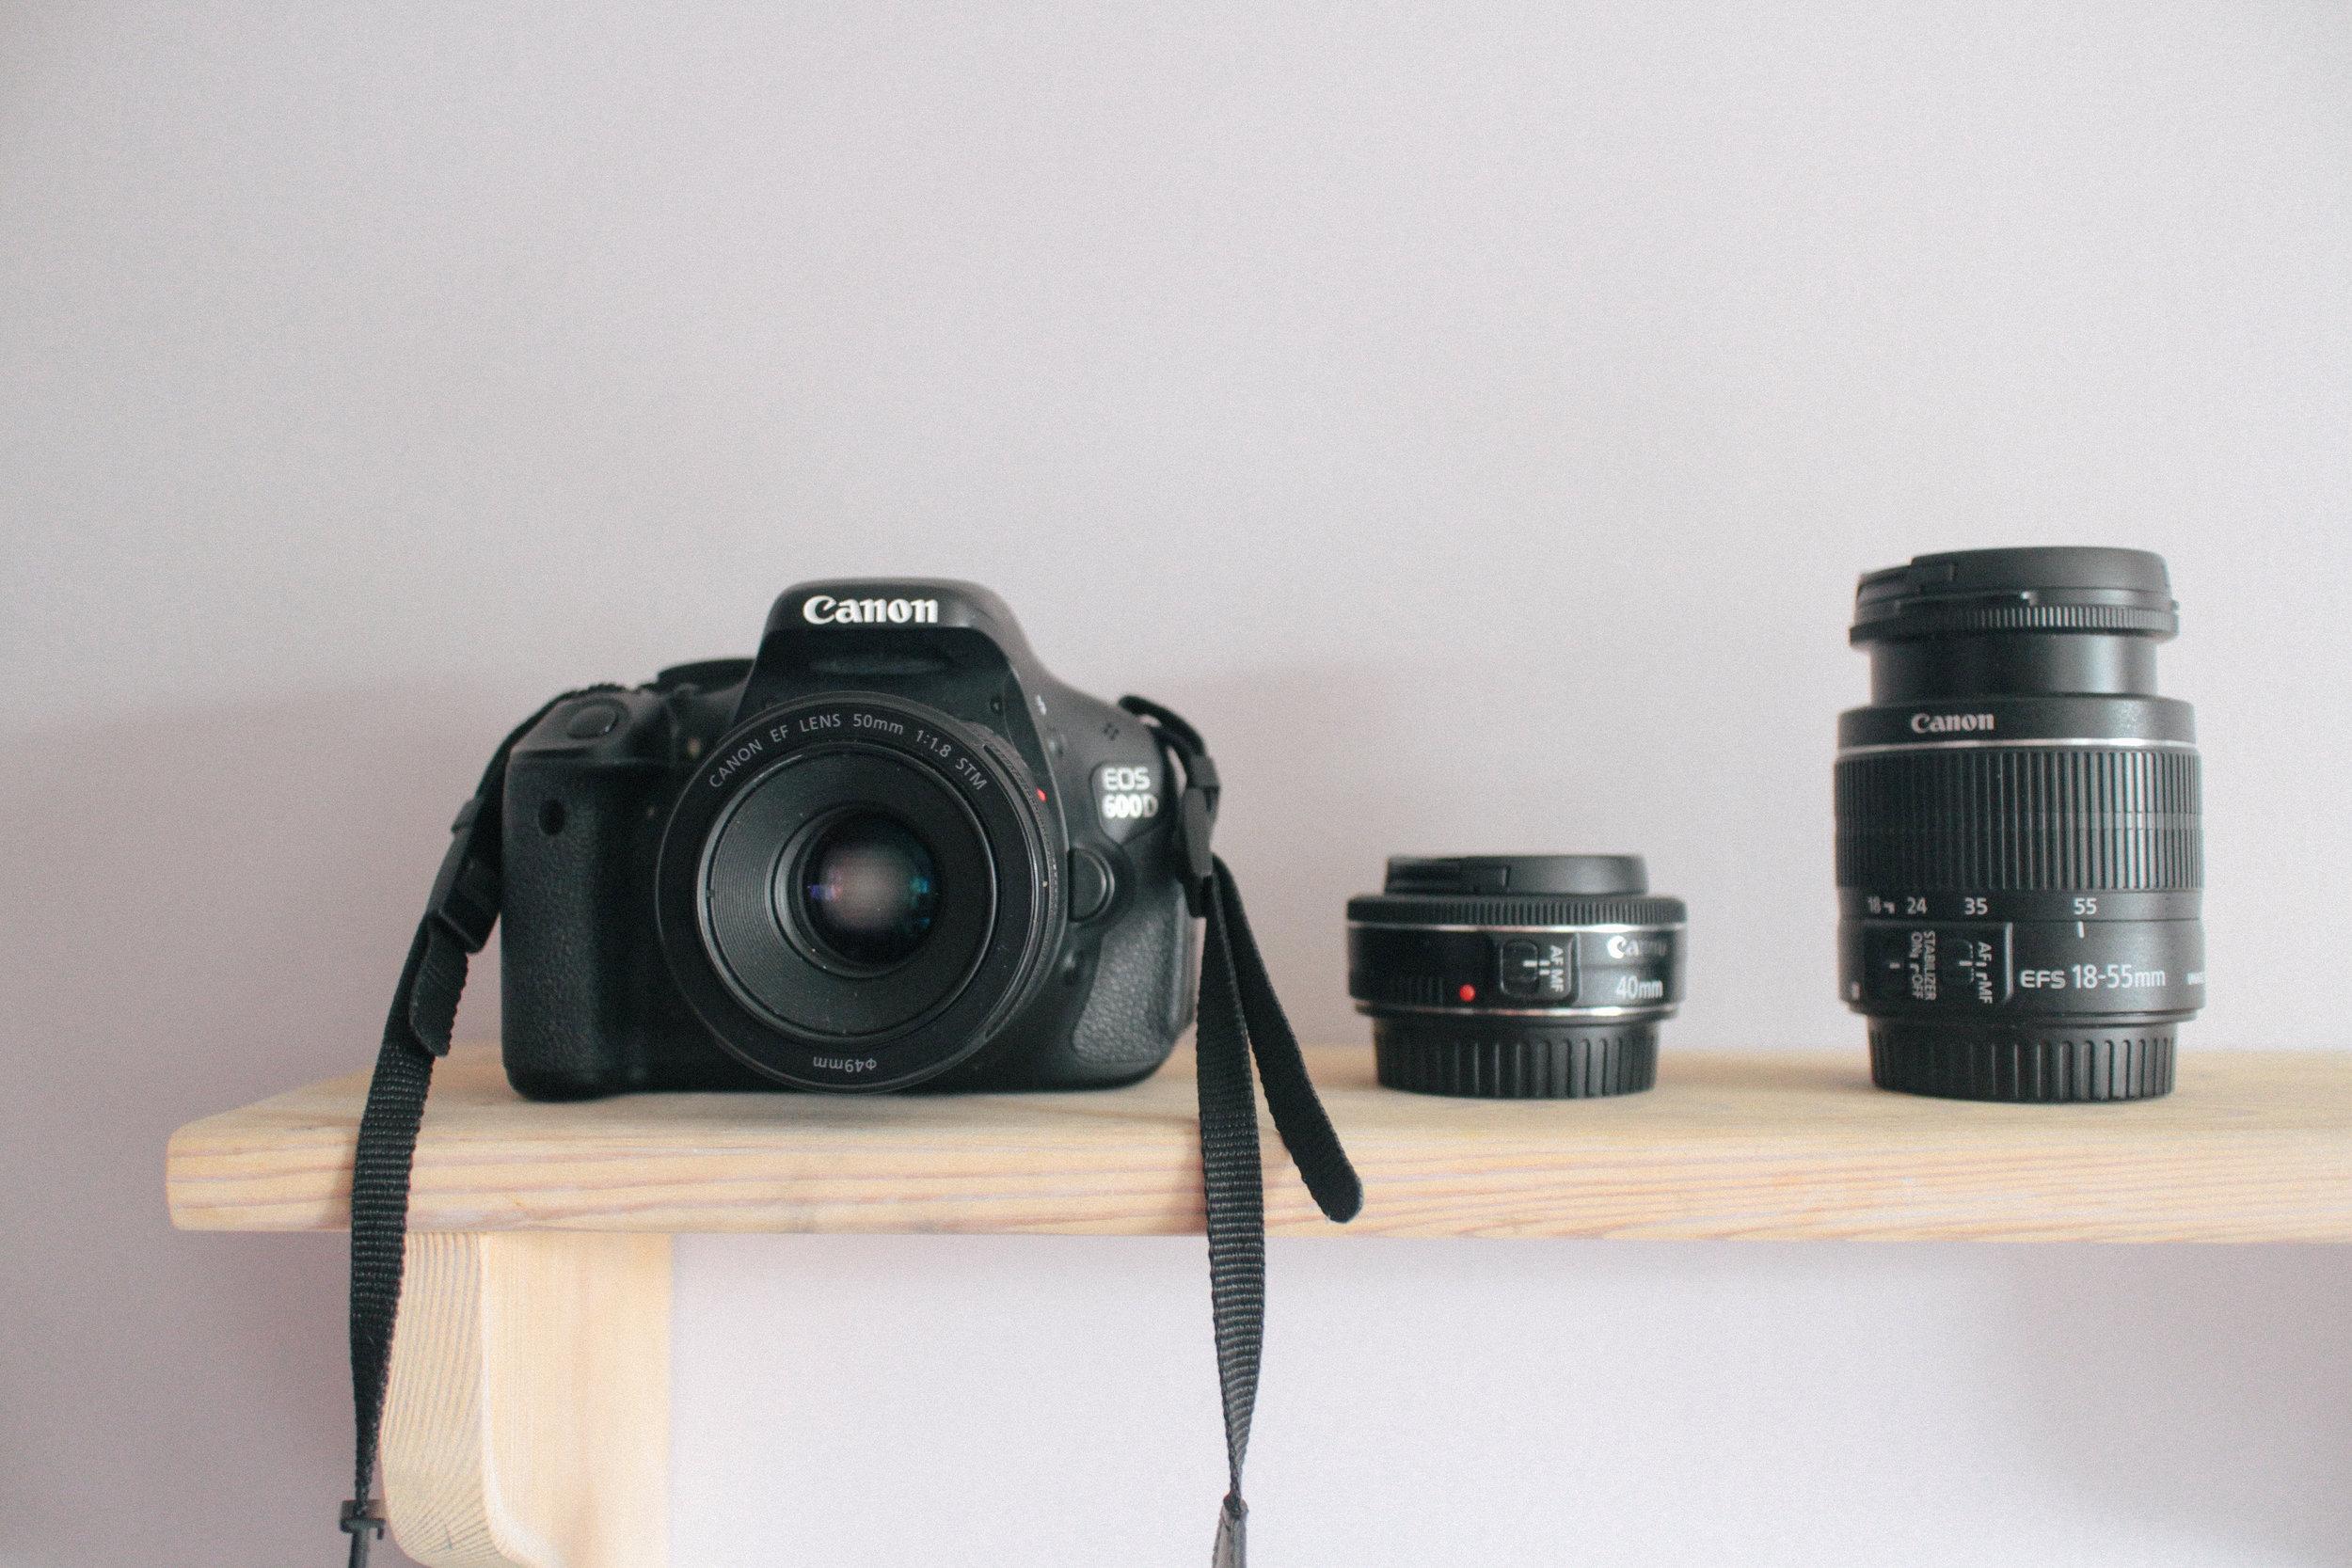 Canon EOS 600D, 40mm f/2.8 lens, 18-55mm f/3.5-5.6 lens